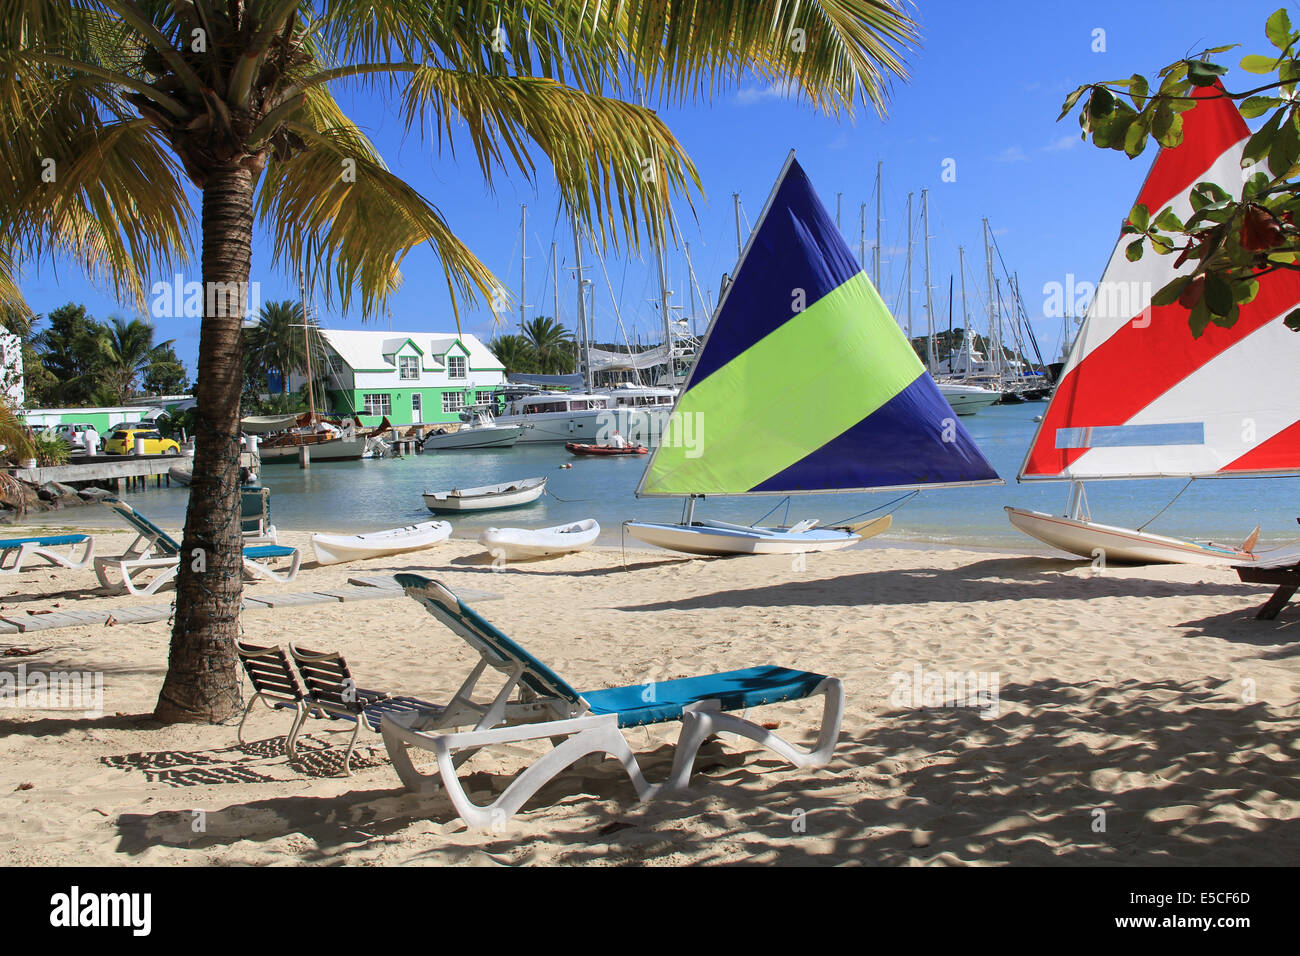 Windsurf Boards sentado en un hotel de playa cerca de Falmouth Harbor Marina en Antigua Barbuda. Imagen De Stock